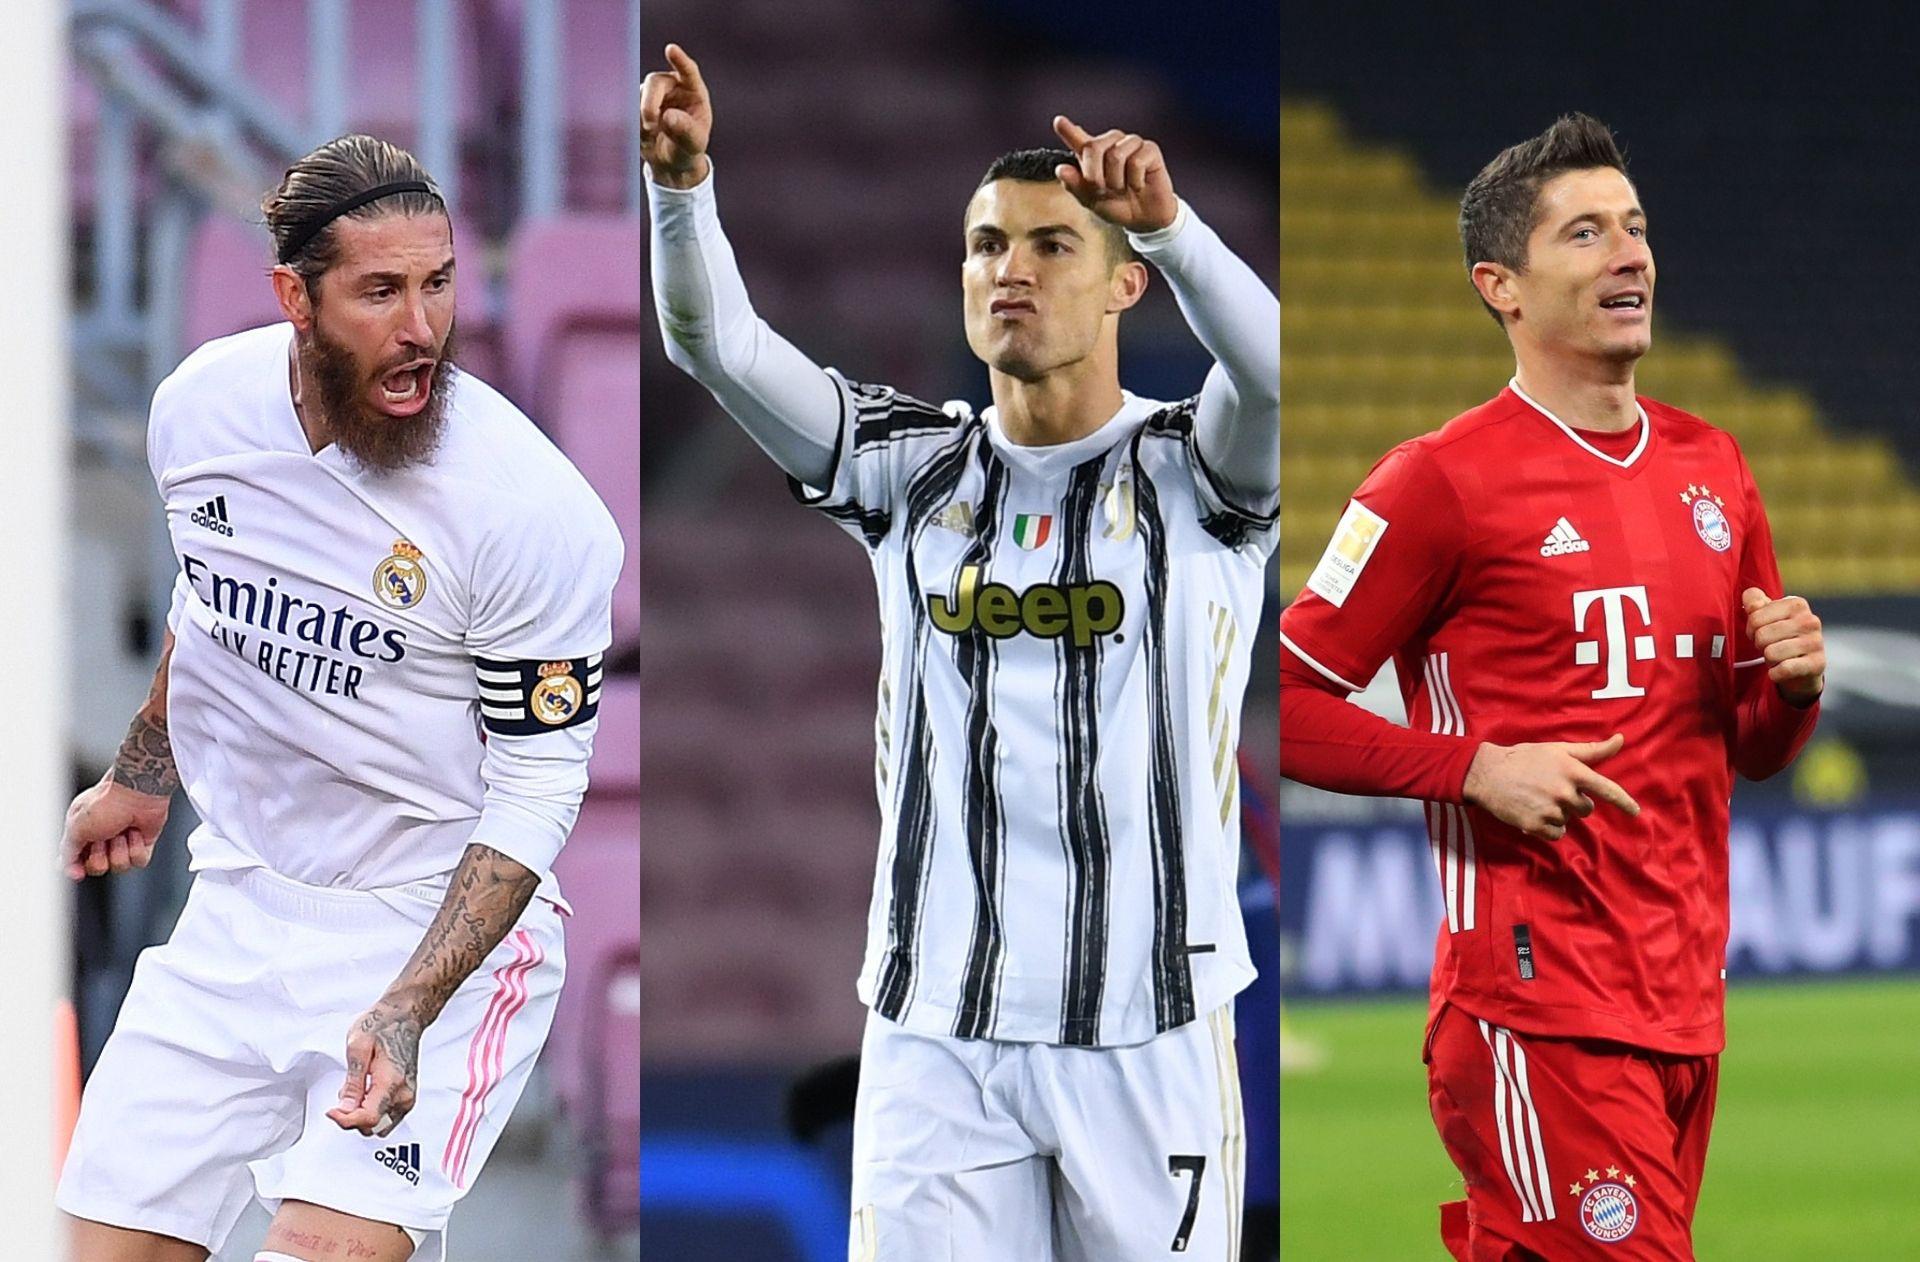 Sergio Ramos of Real Madrid, Cristiano Ronaldo of Juventus, Robert Lewandowski of Bayern Munich